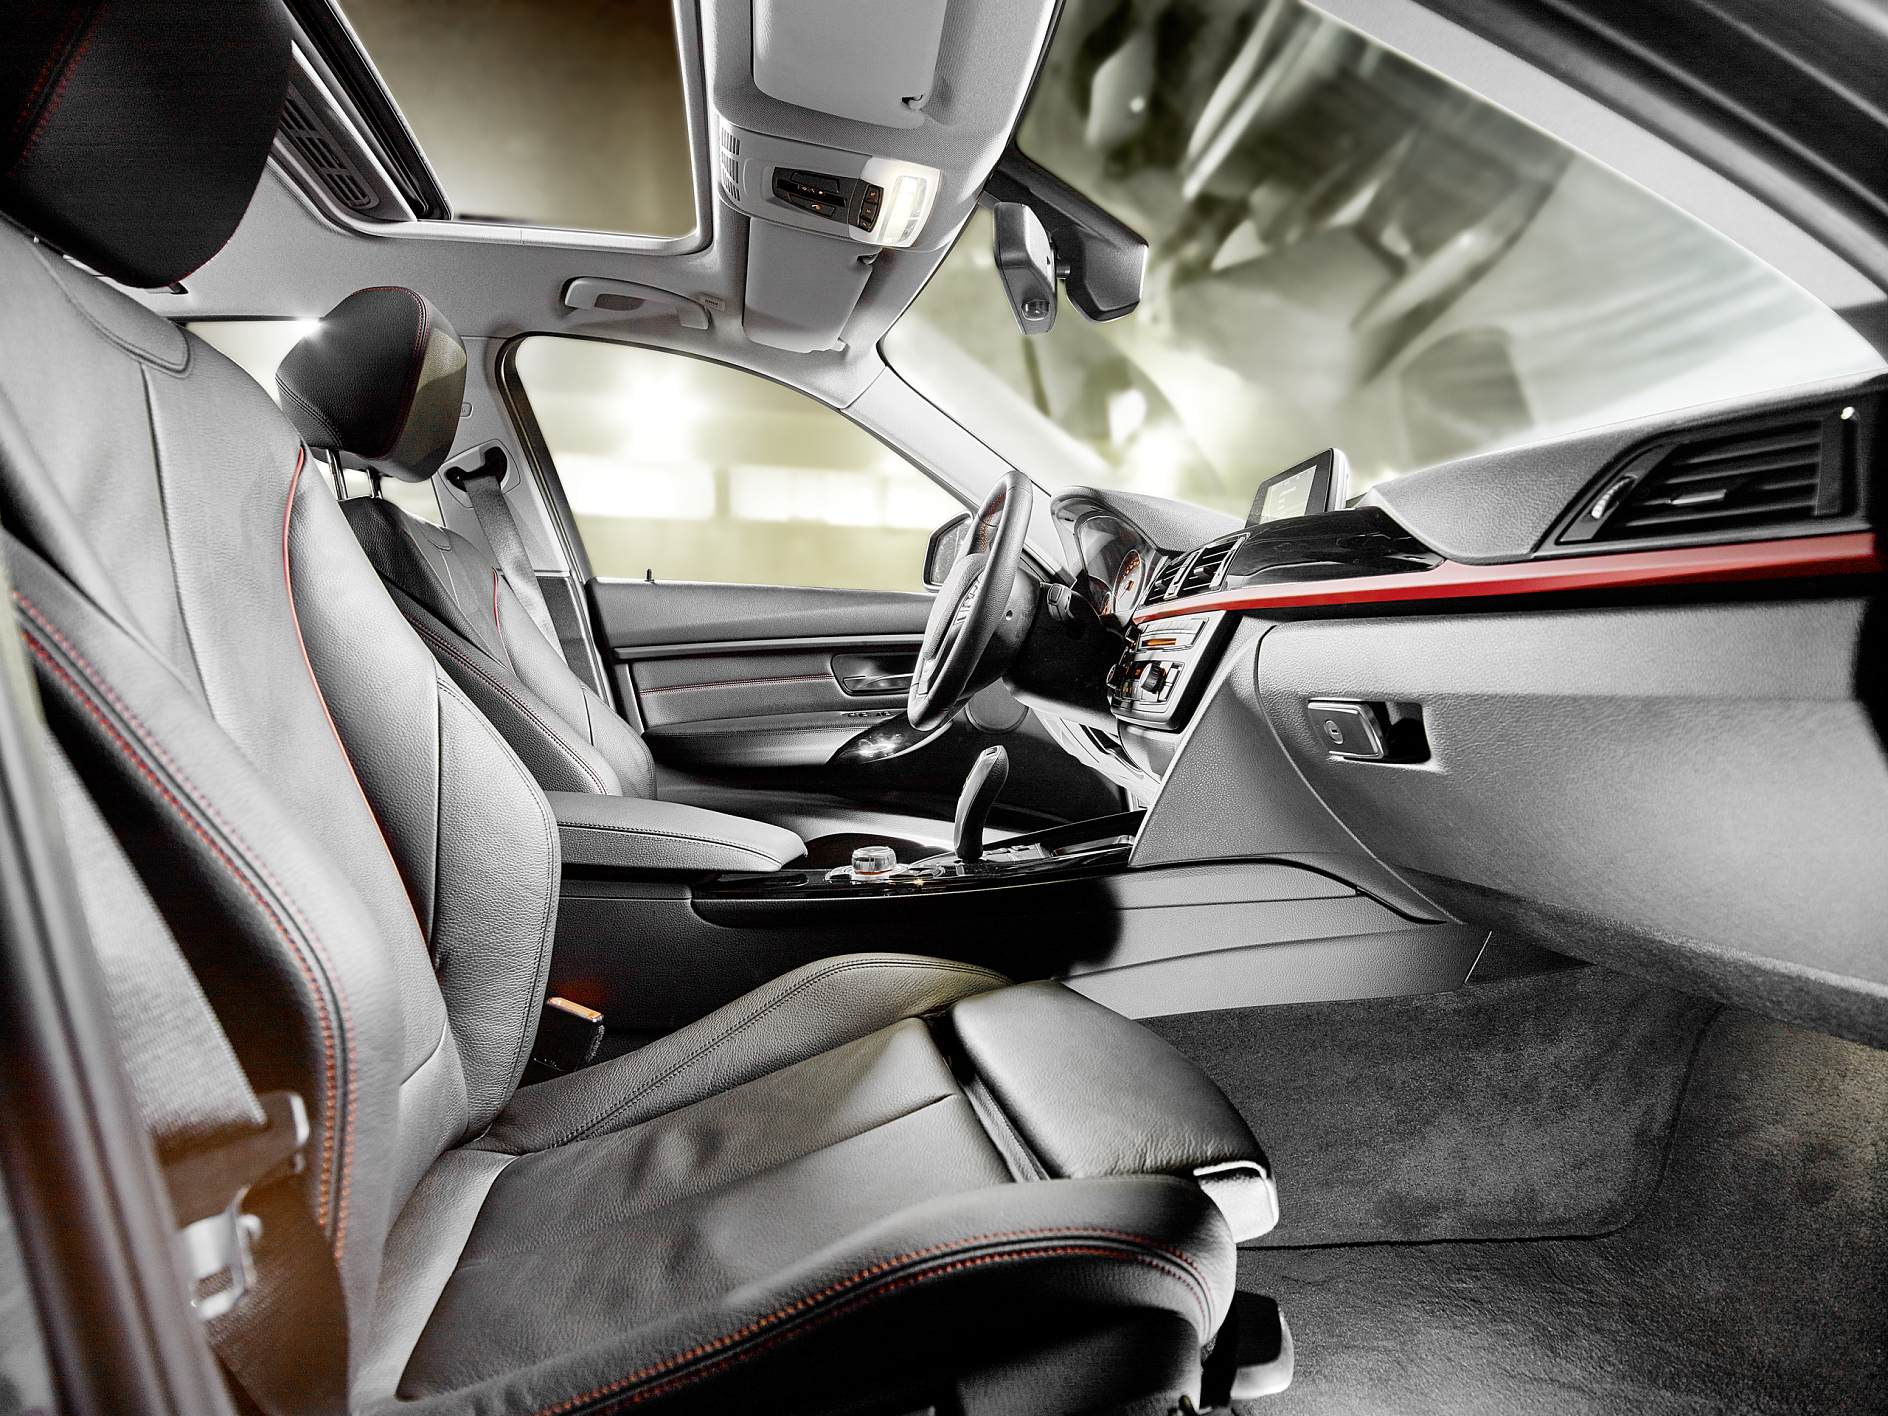 Low Voc Bonding And Lamination Inside Cars Tesa